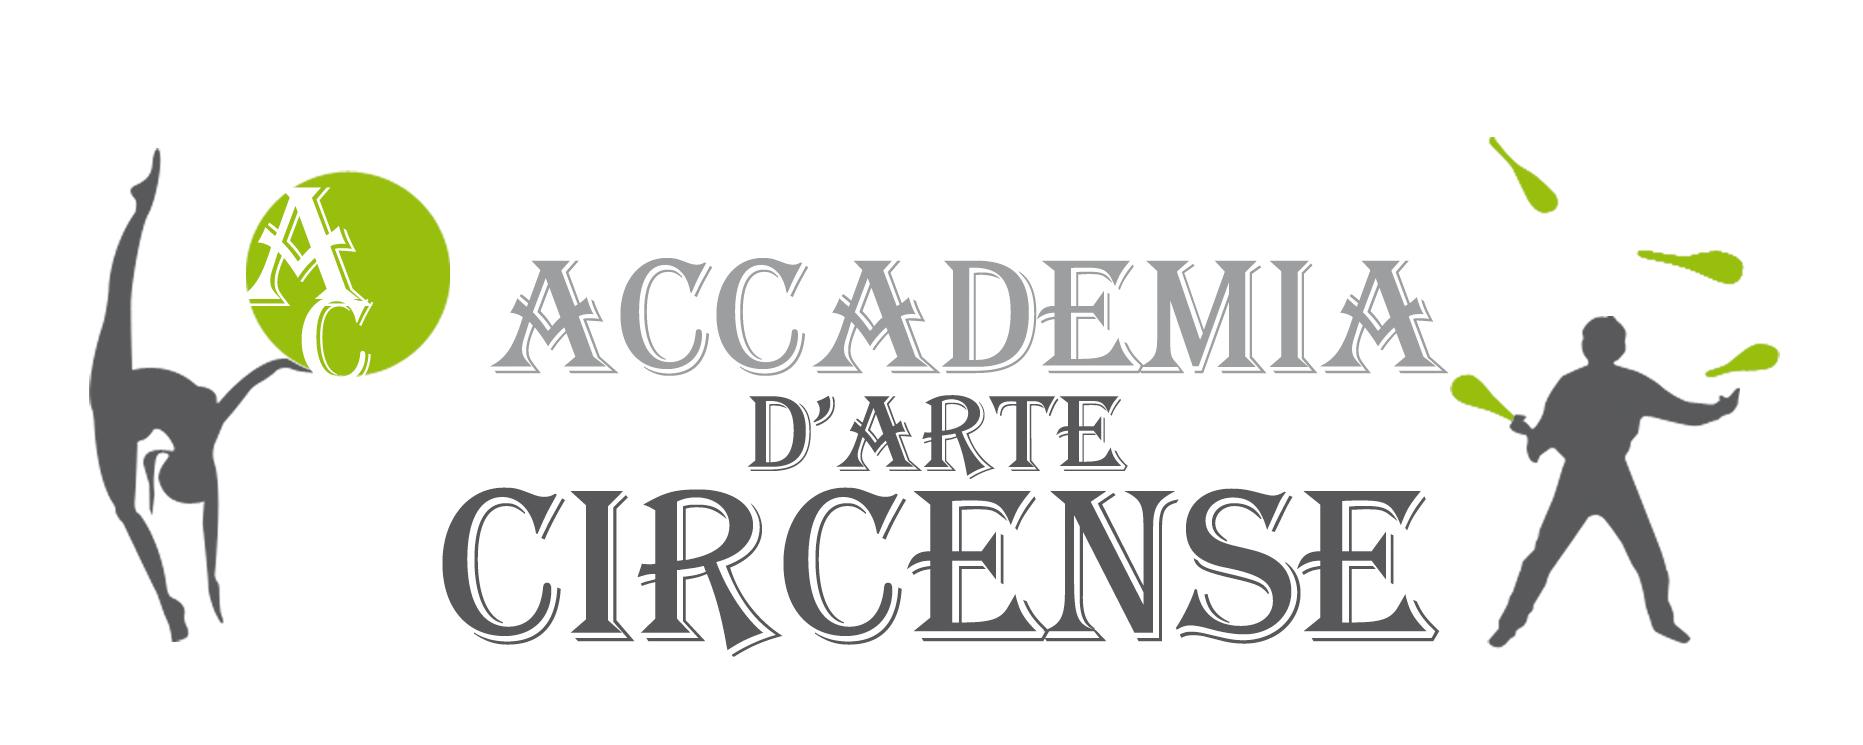 Accademia d'arte circense di Verona